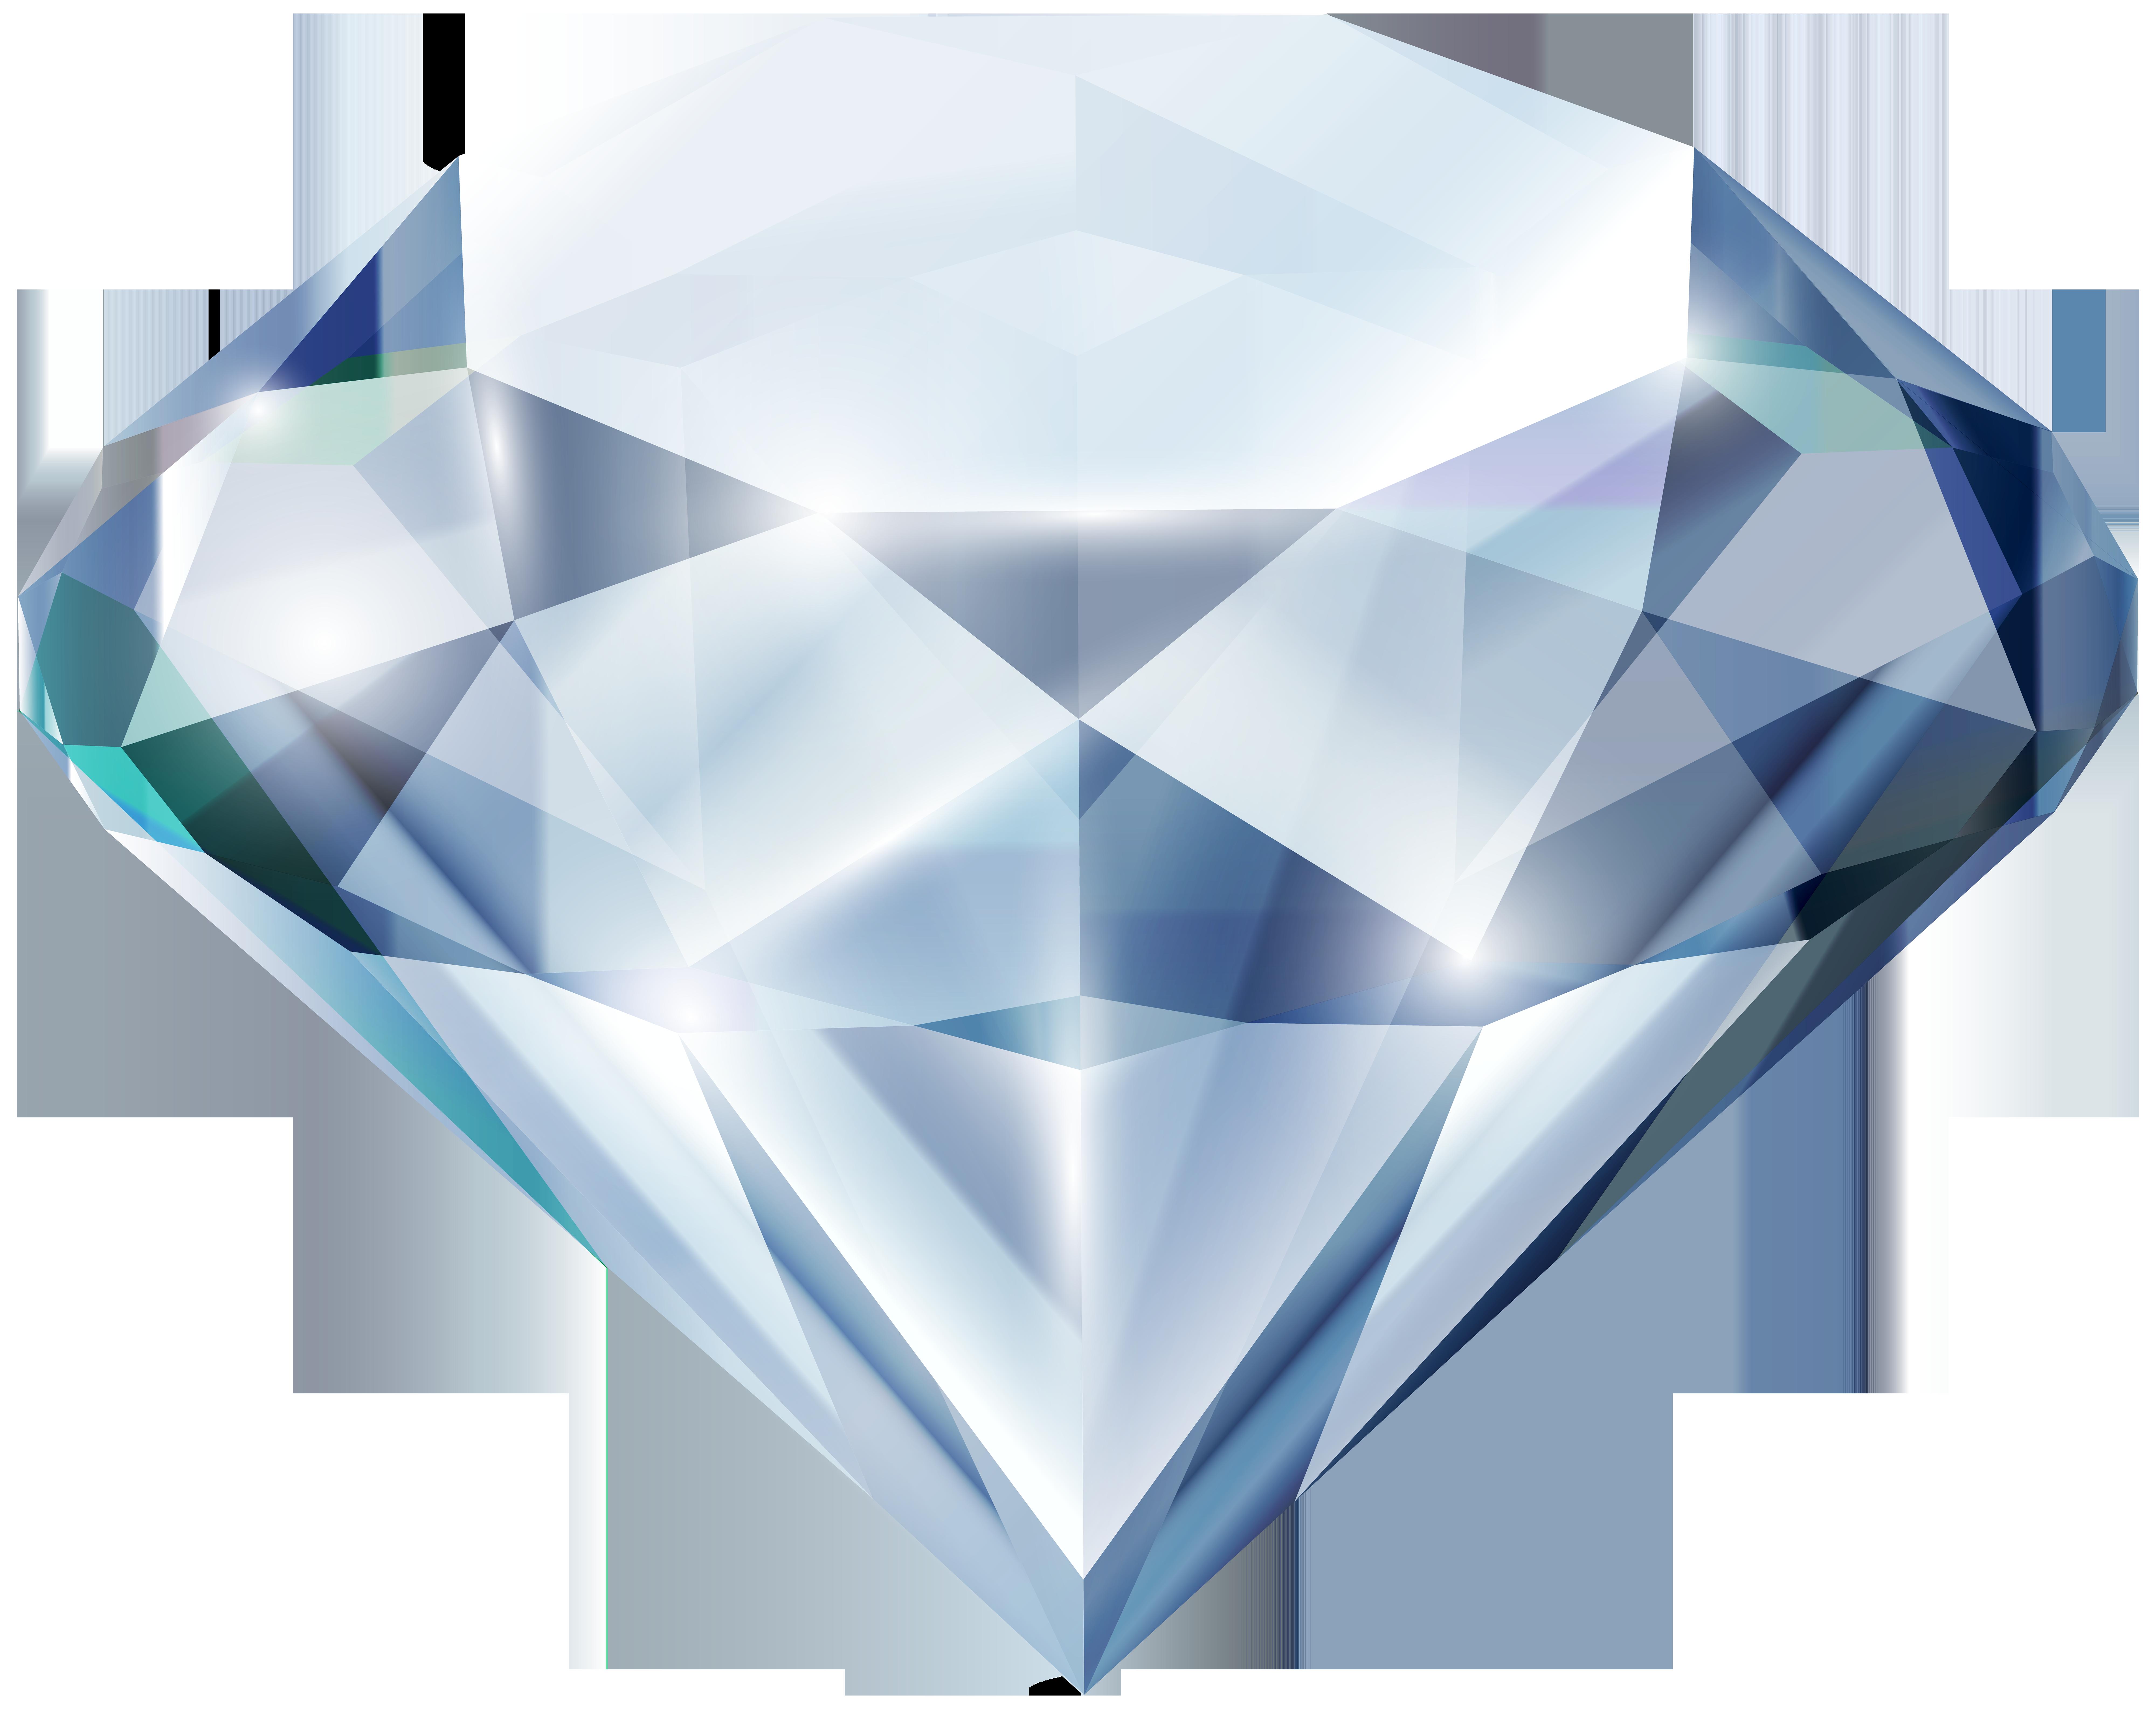 Transparent clip art image. Diamond clipart rock